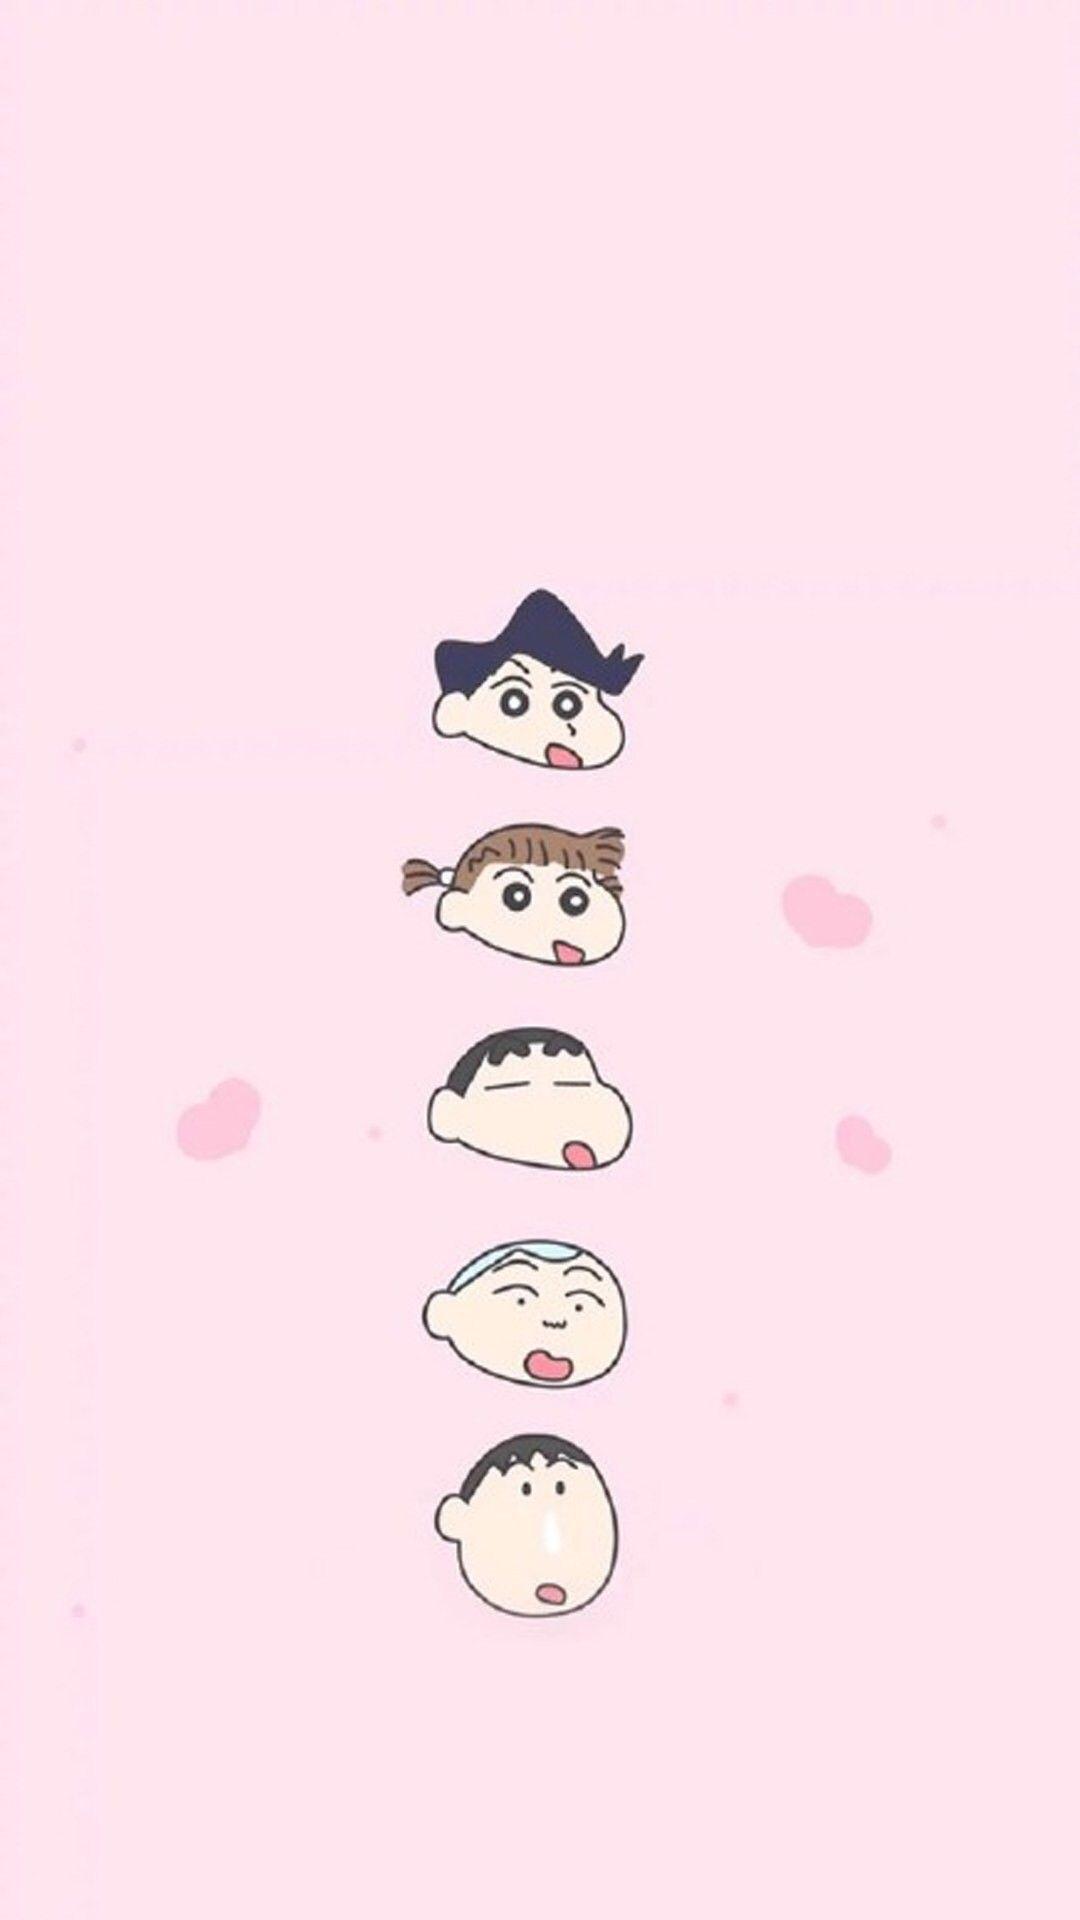 1080x1920 Crayon Shin Chan Iphone Backgrounds Iphone Wallpapers Kawaii Pastel Display Cak Cute Cartoon Wallpapers Shin Chan Wallpapers Cartoon Wallpaper